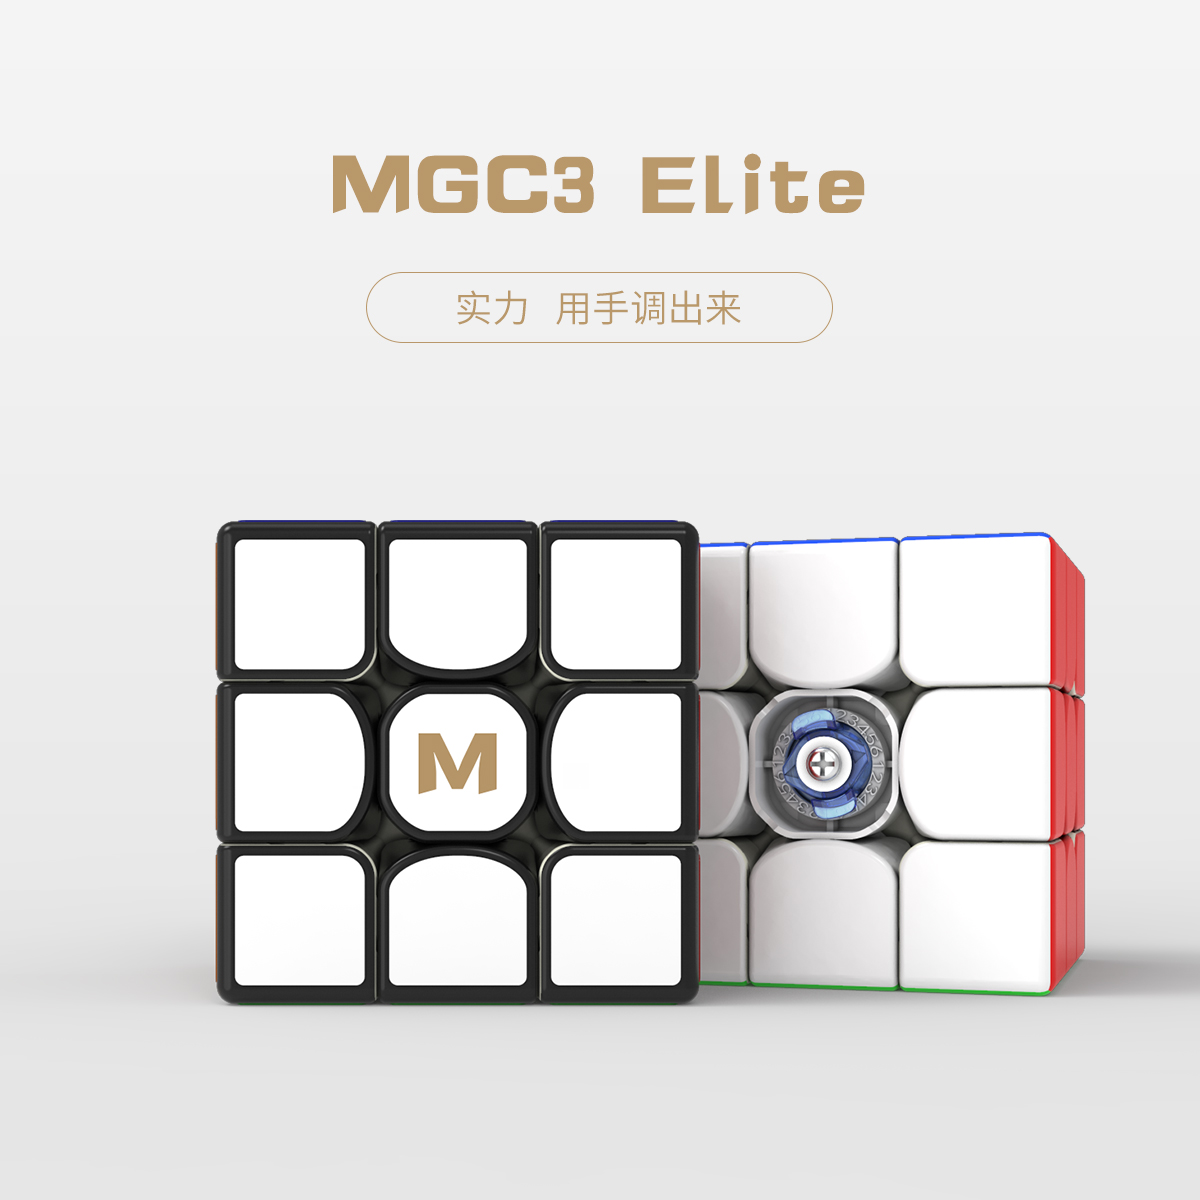 NEW YongJun MGC3 Elite M 3x3 Black Speed Cube YJ MGC Elite Magnetic 3x3x3 Magico Cubes Puzzle Educational Toys For Children